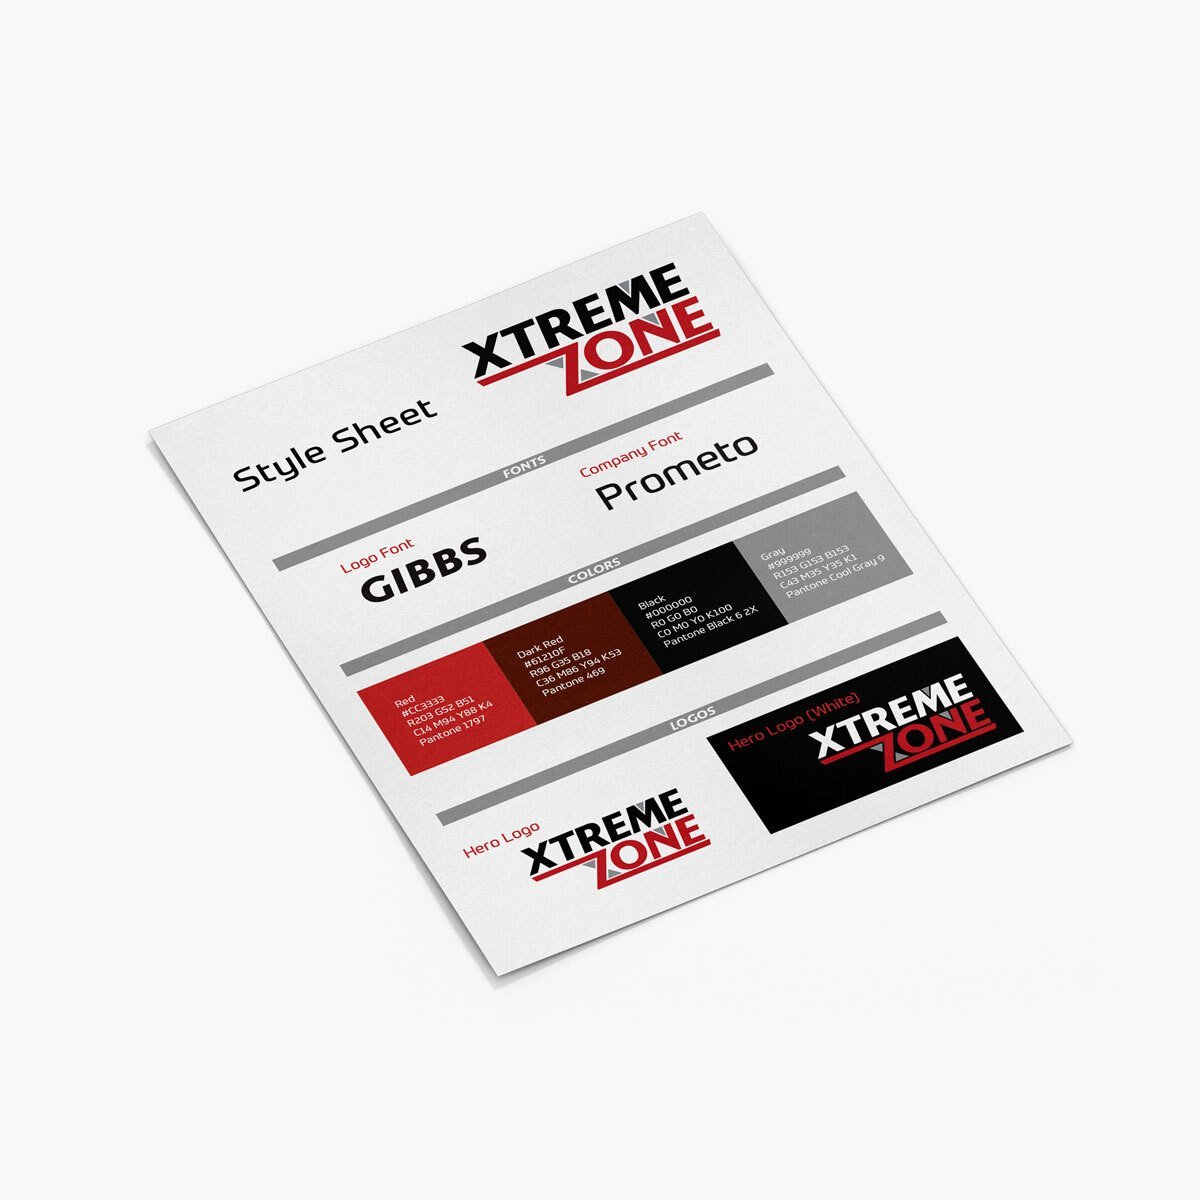 Xtreme Zone Brand Design by BrandSwan, a brand design company